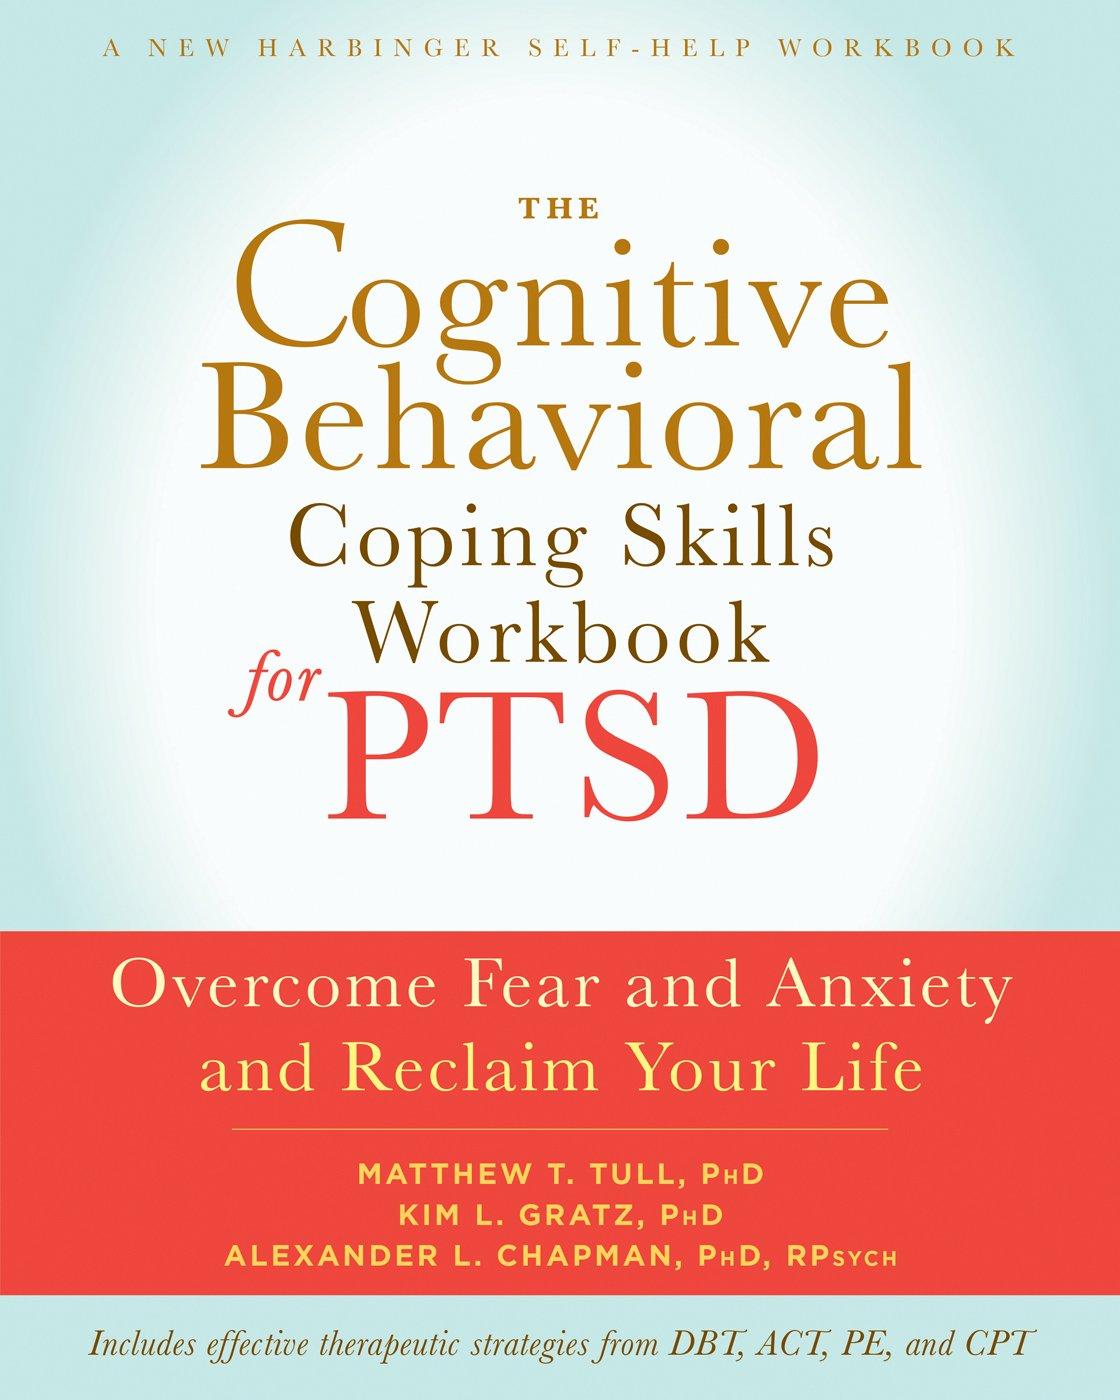 Workbooks anti anxiety workbook : The Cognitive Behavioral Coping Skills Workbook for PTSD: Overcome ...